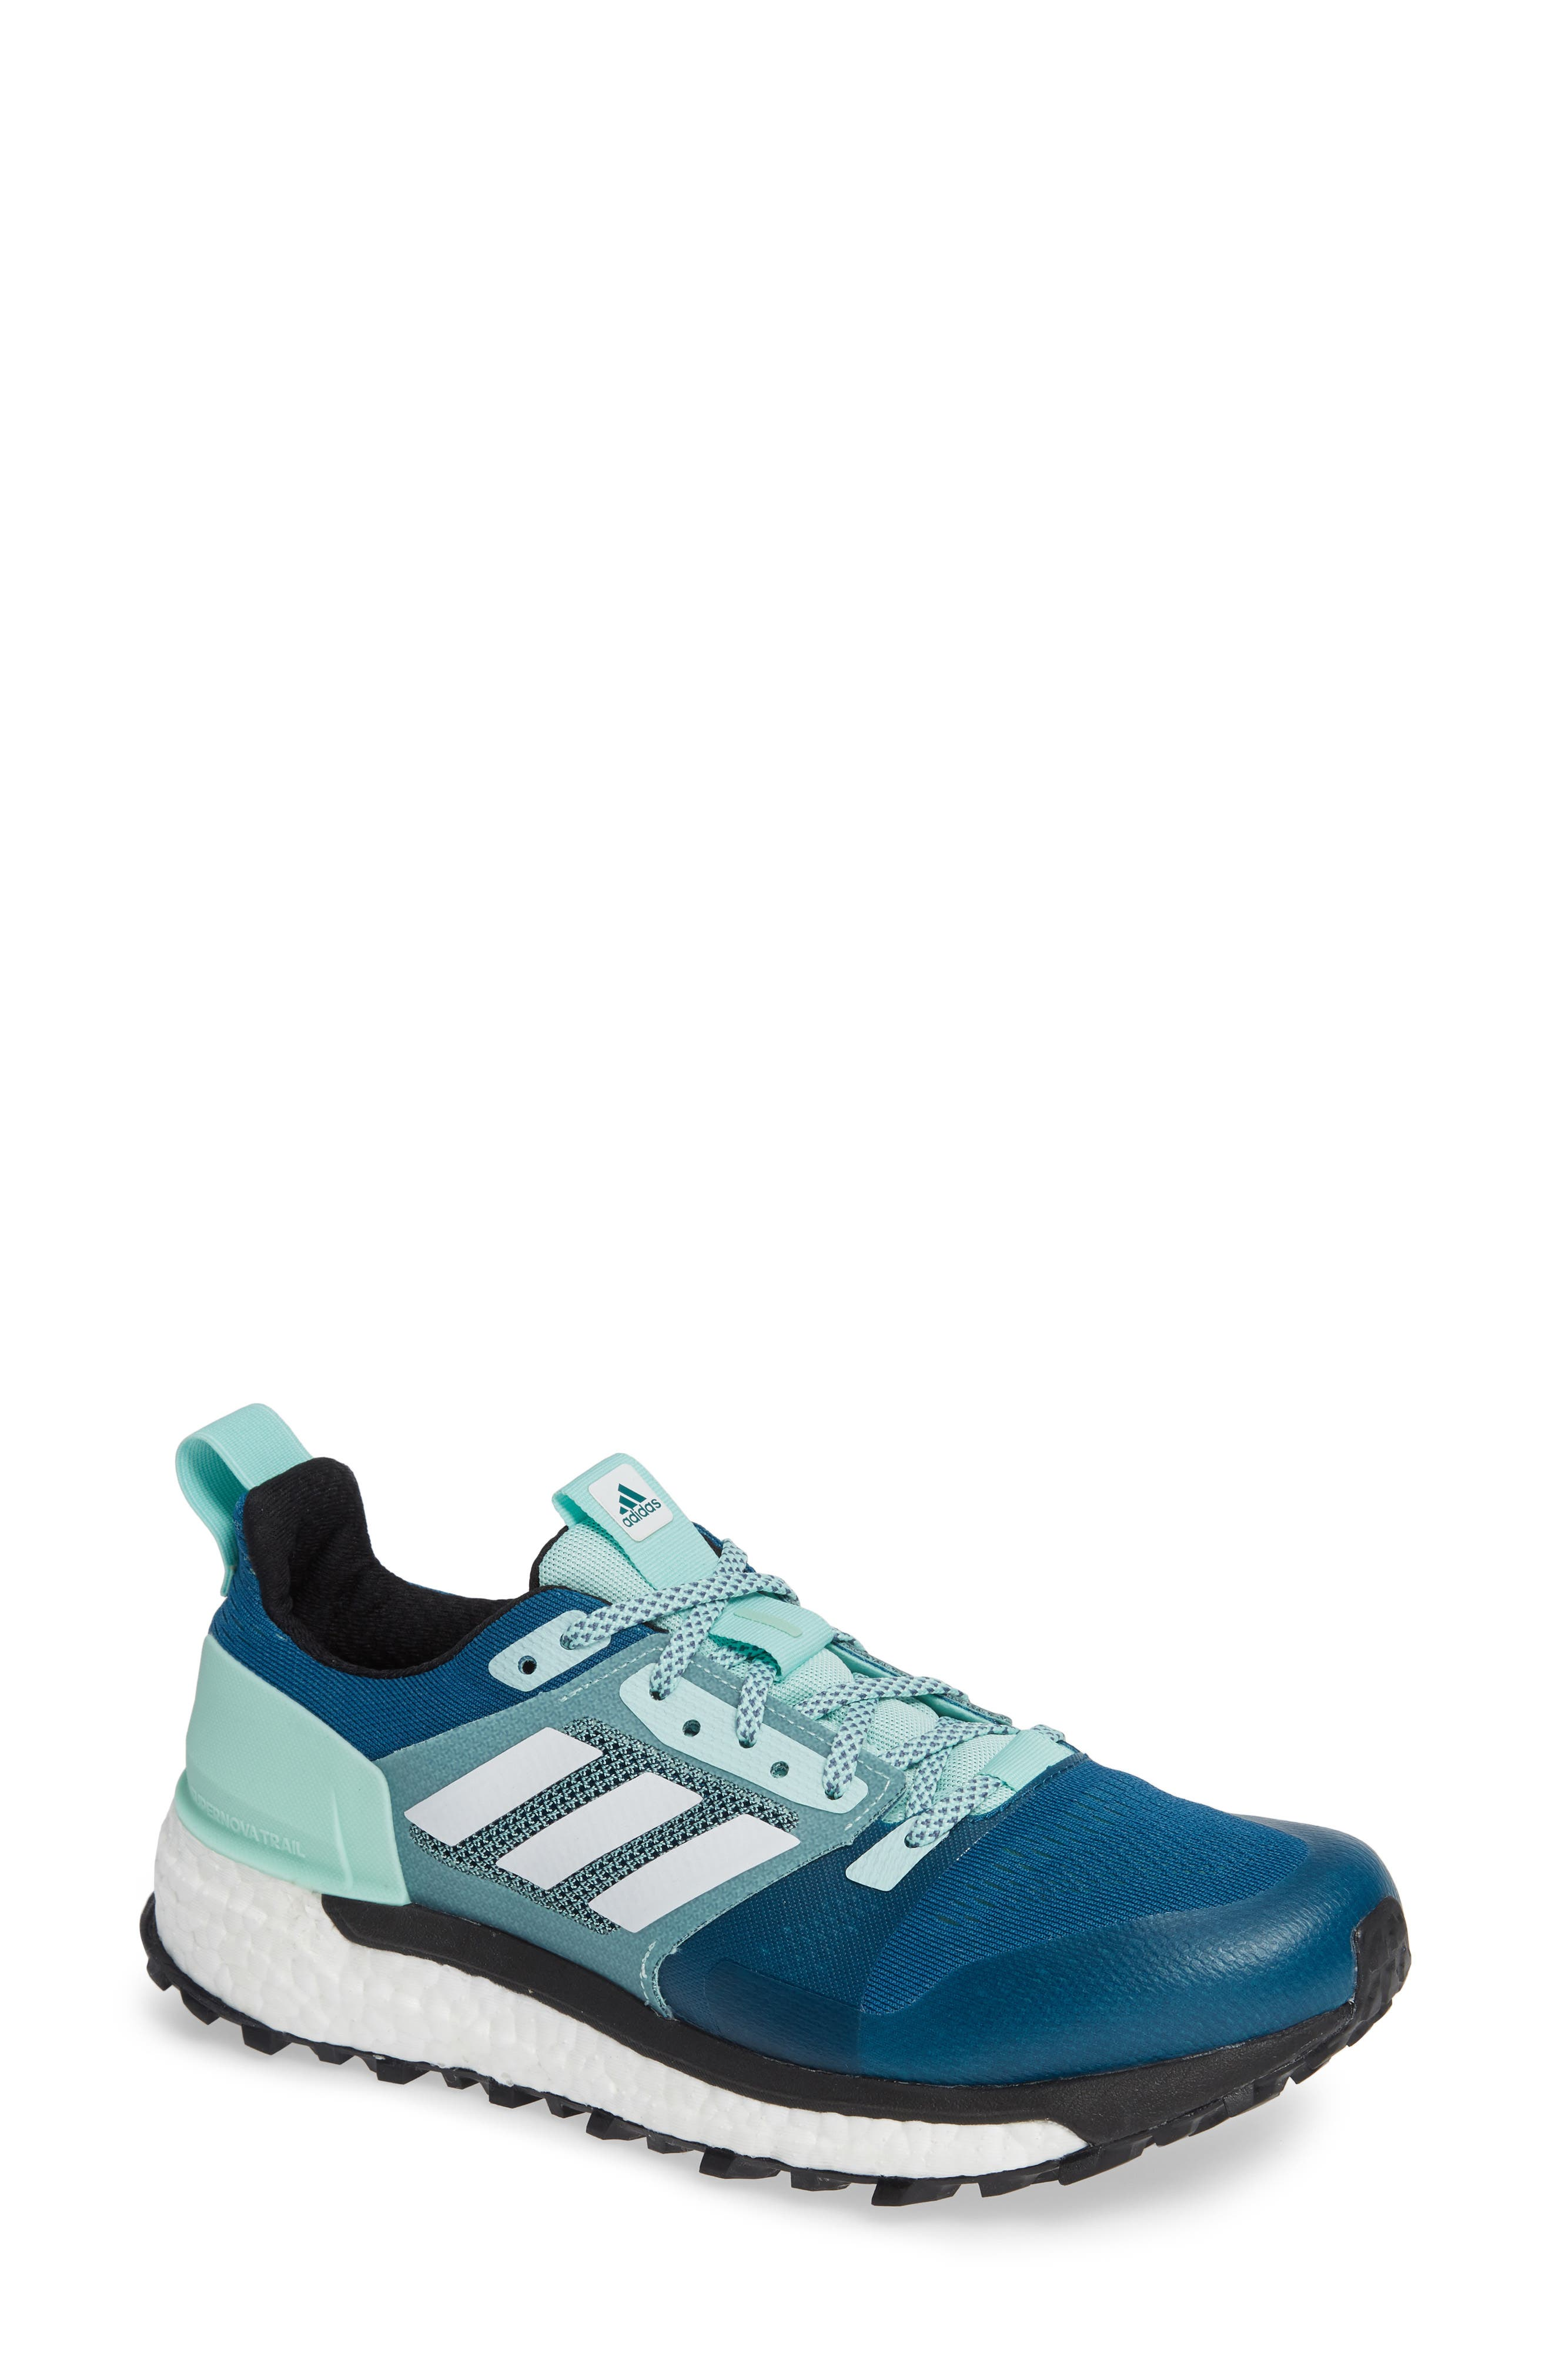 Supernova Trail Running Shoe,                         Main,                         color, 440